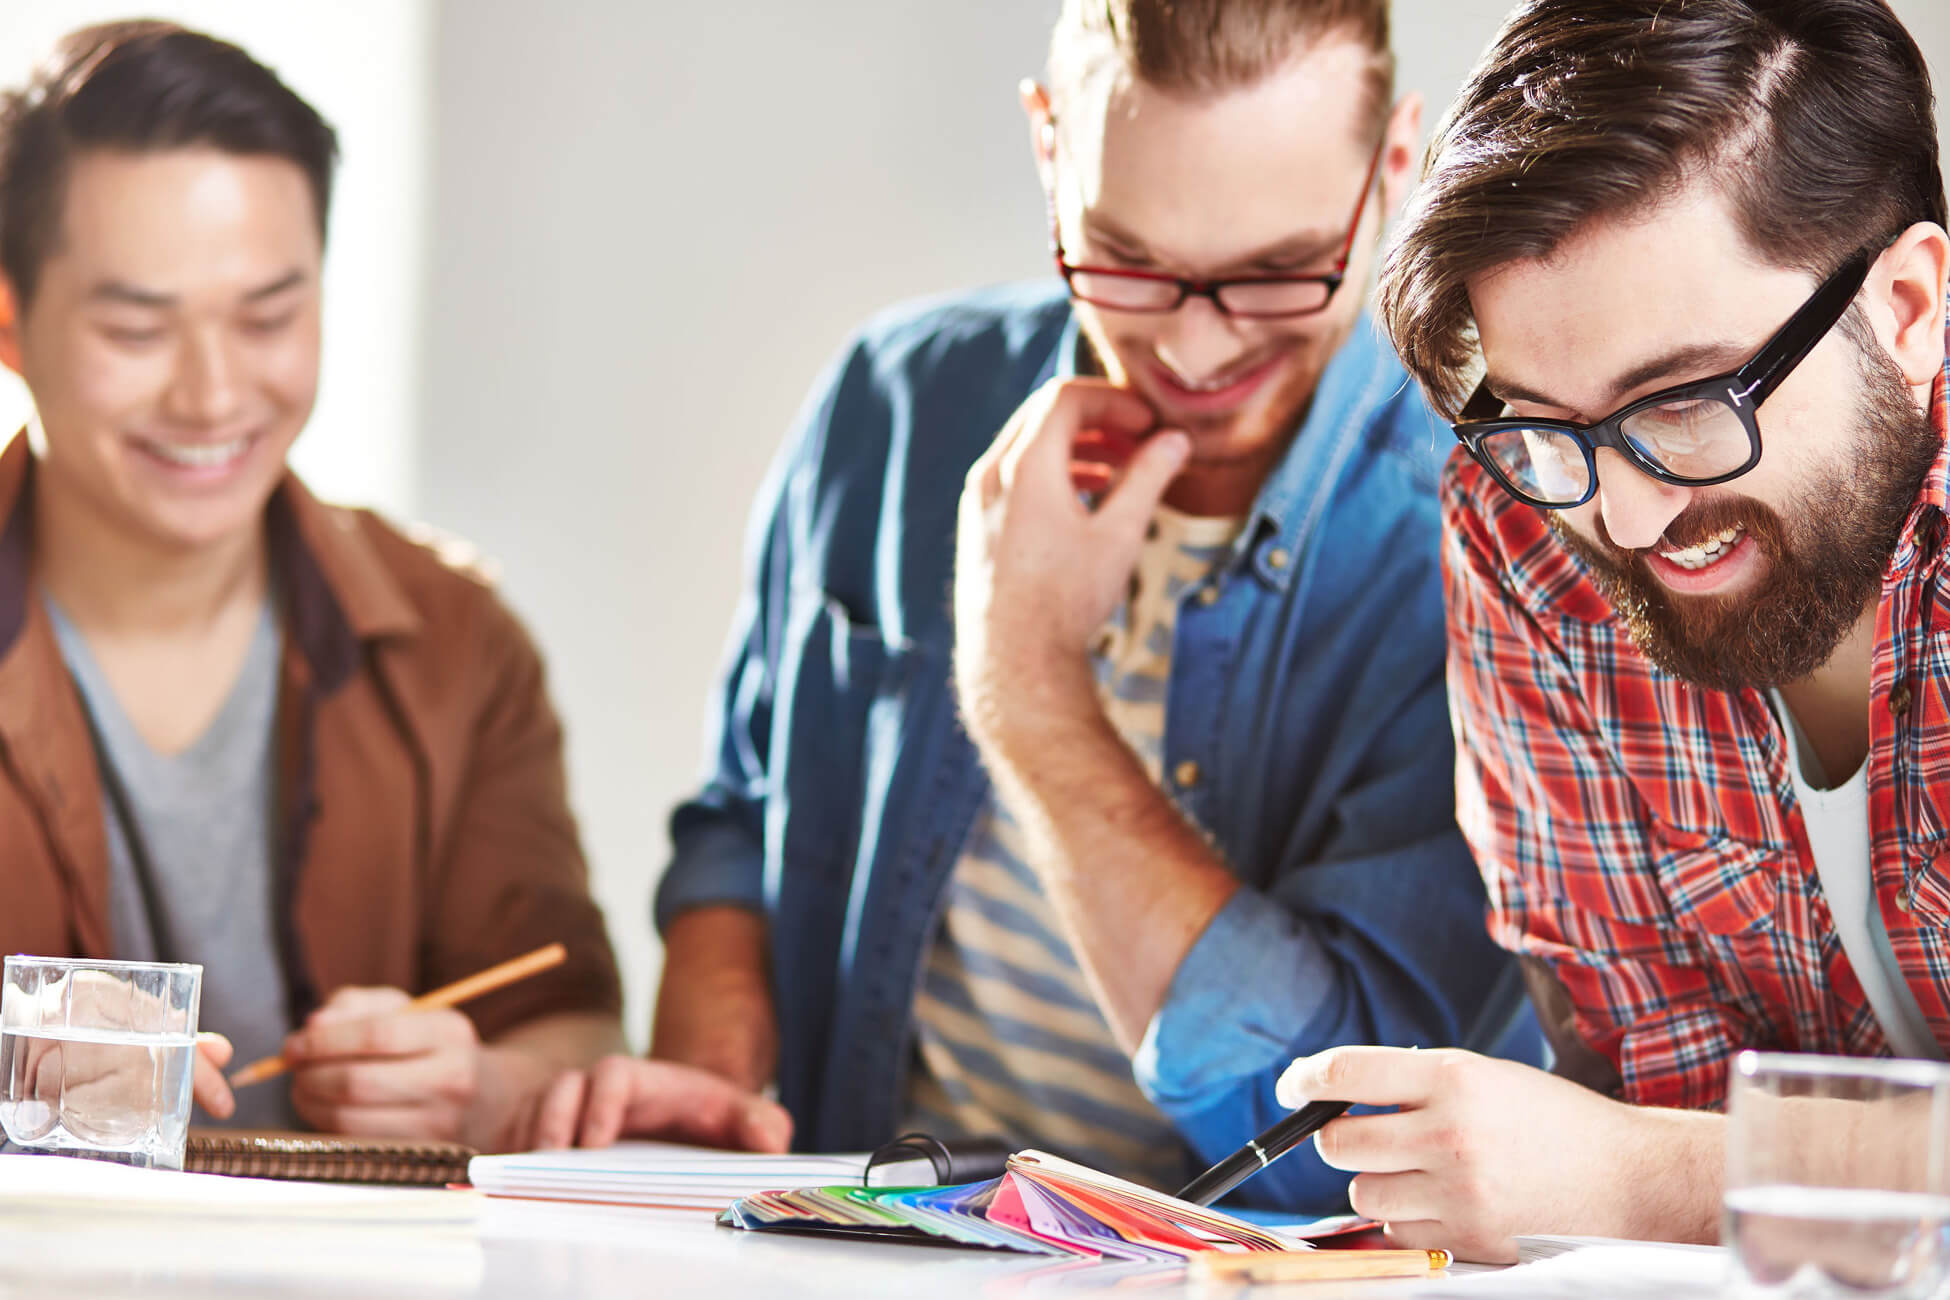 Duel offer creative agency services including, ui design, ux design, web design and web development